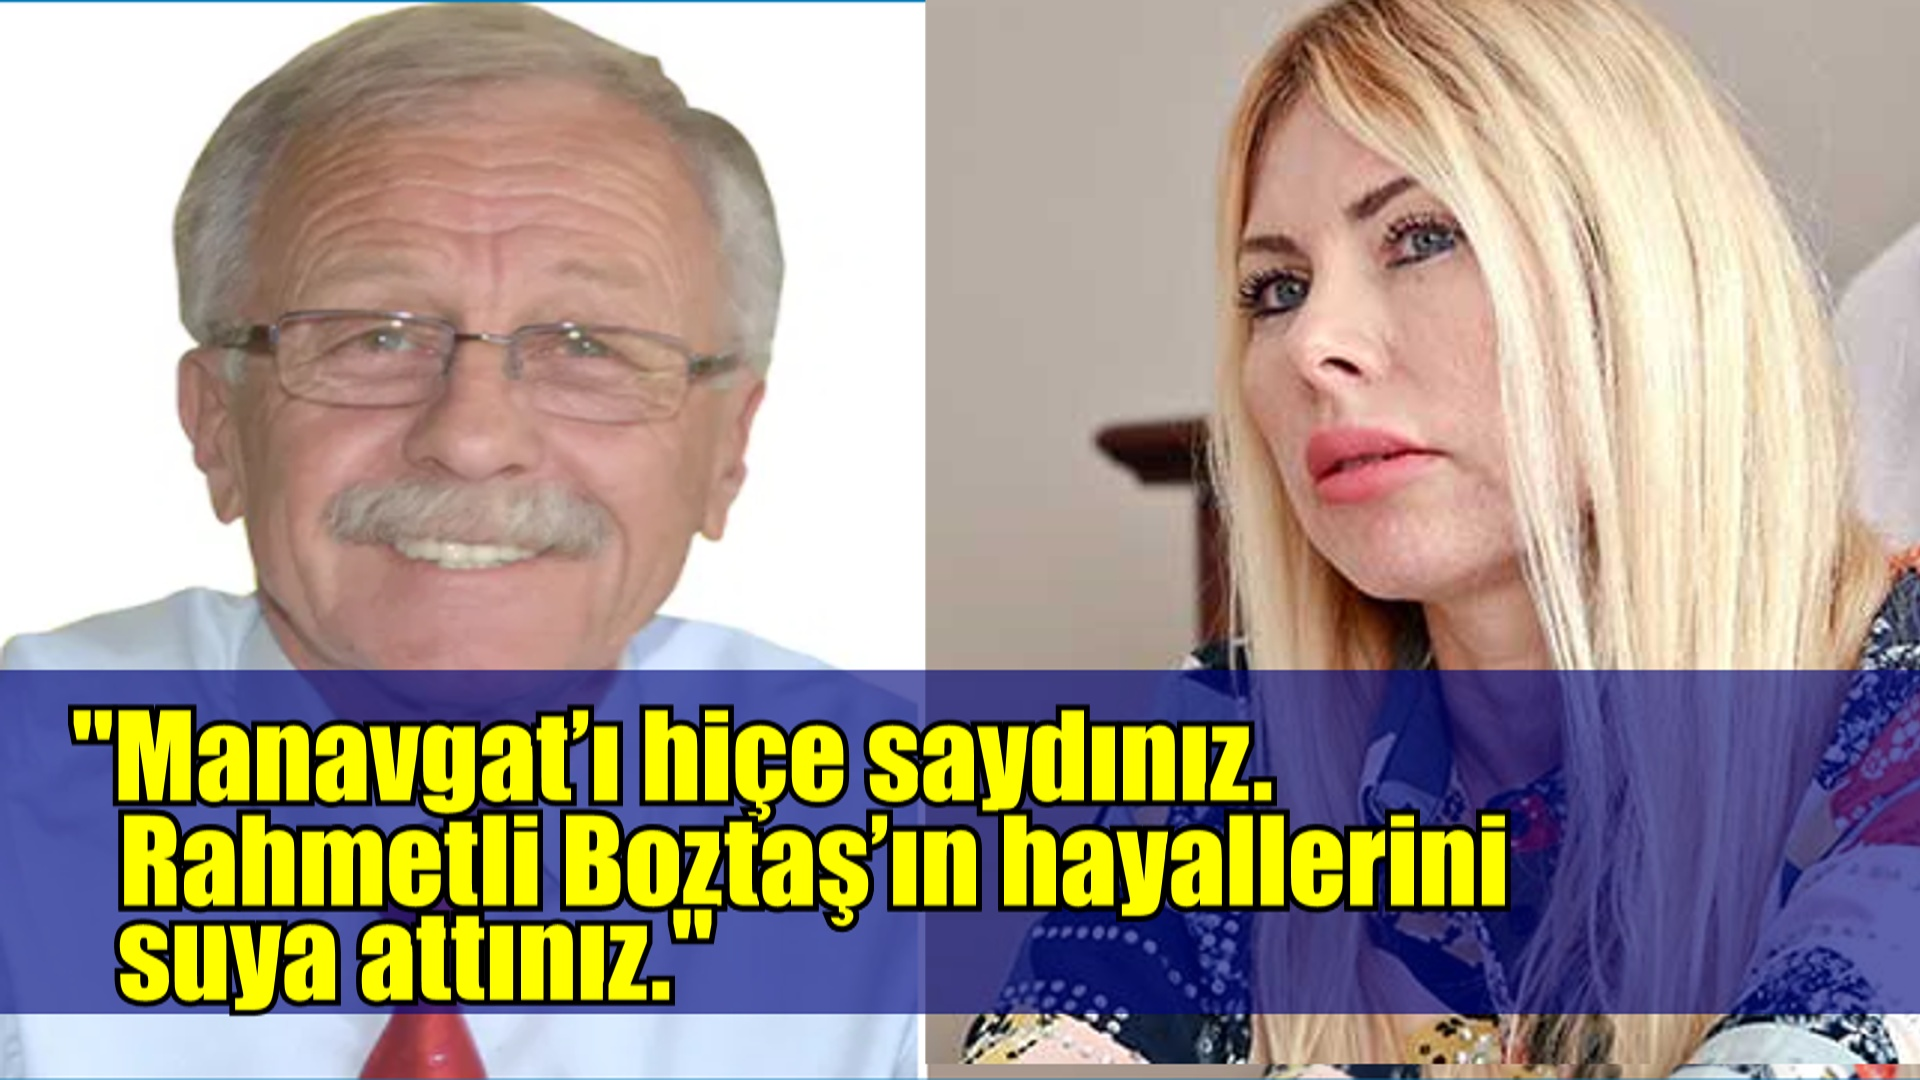 'Rahmetli Boztaş'ın hayallerini suya attınız'